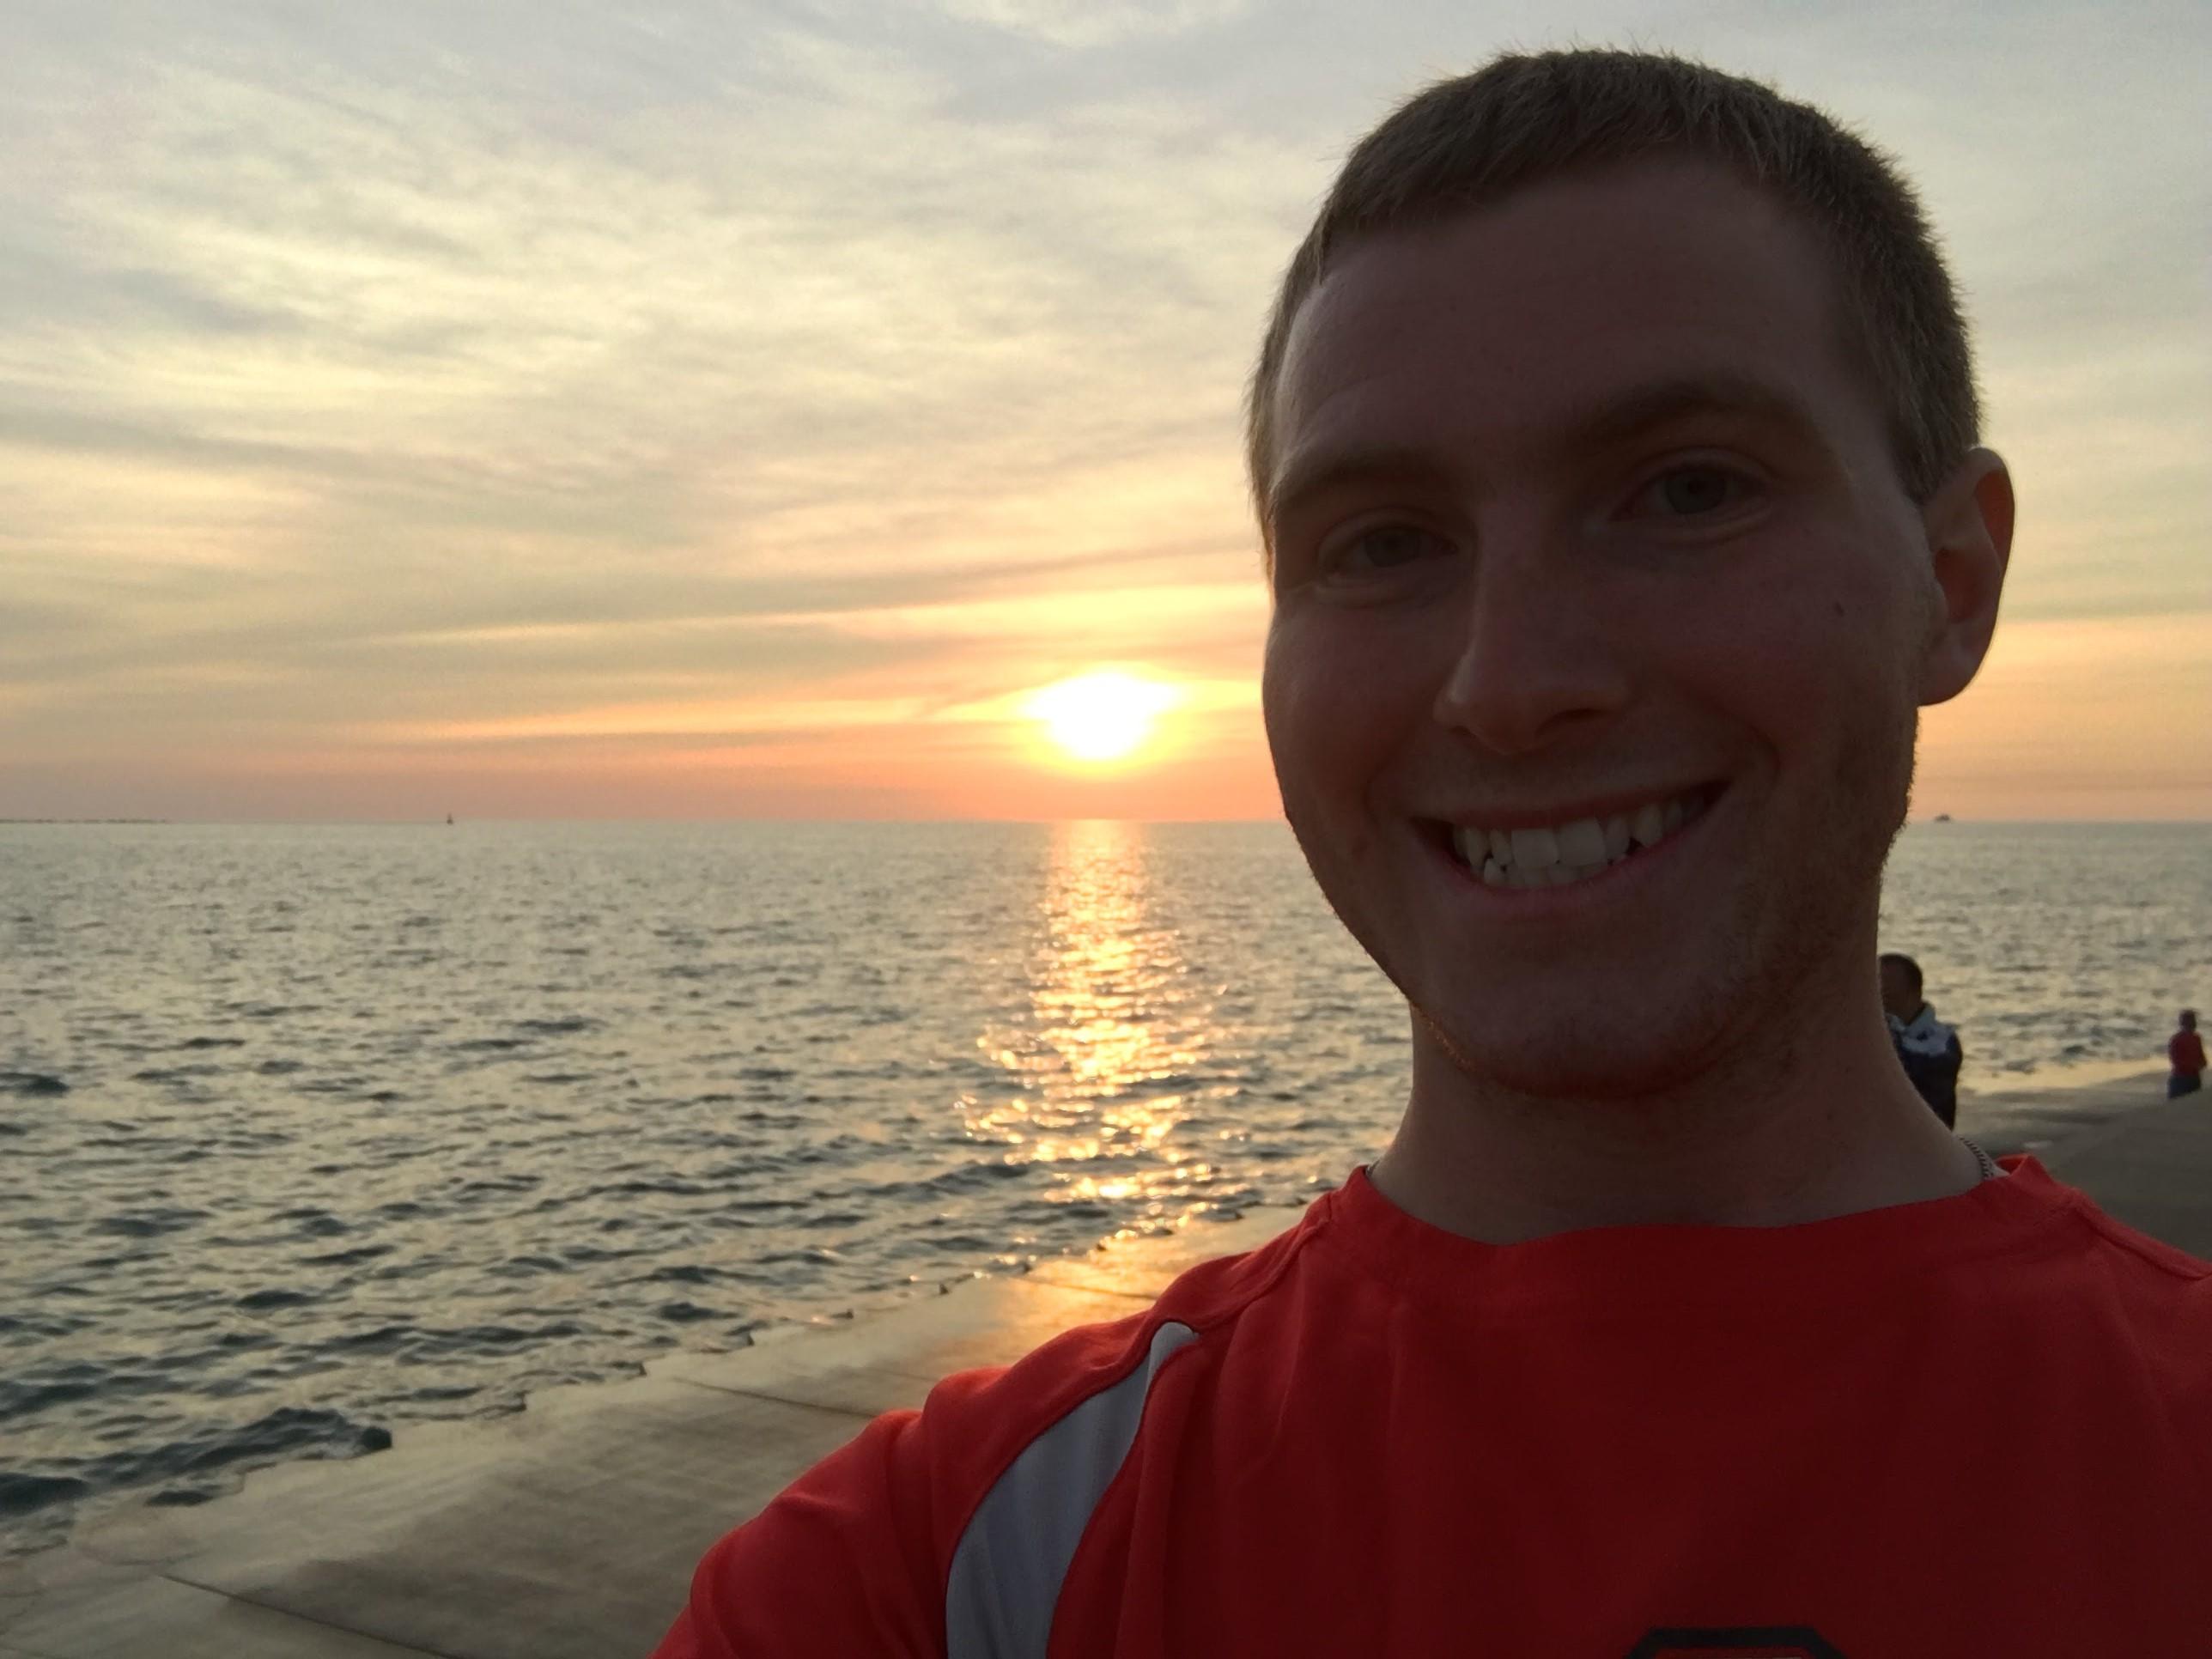 Sunrise Selfie